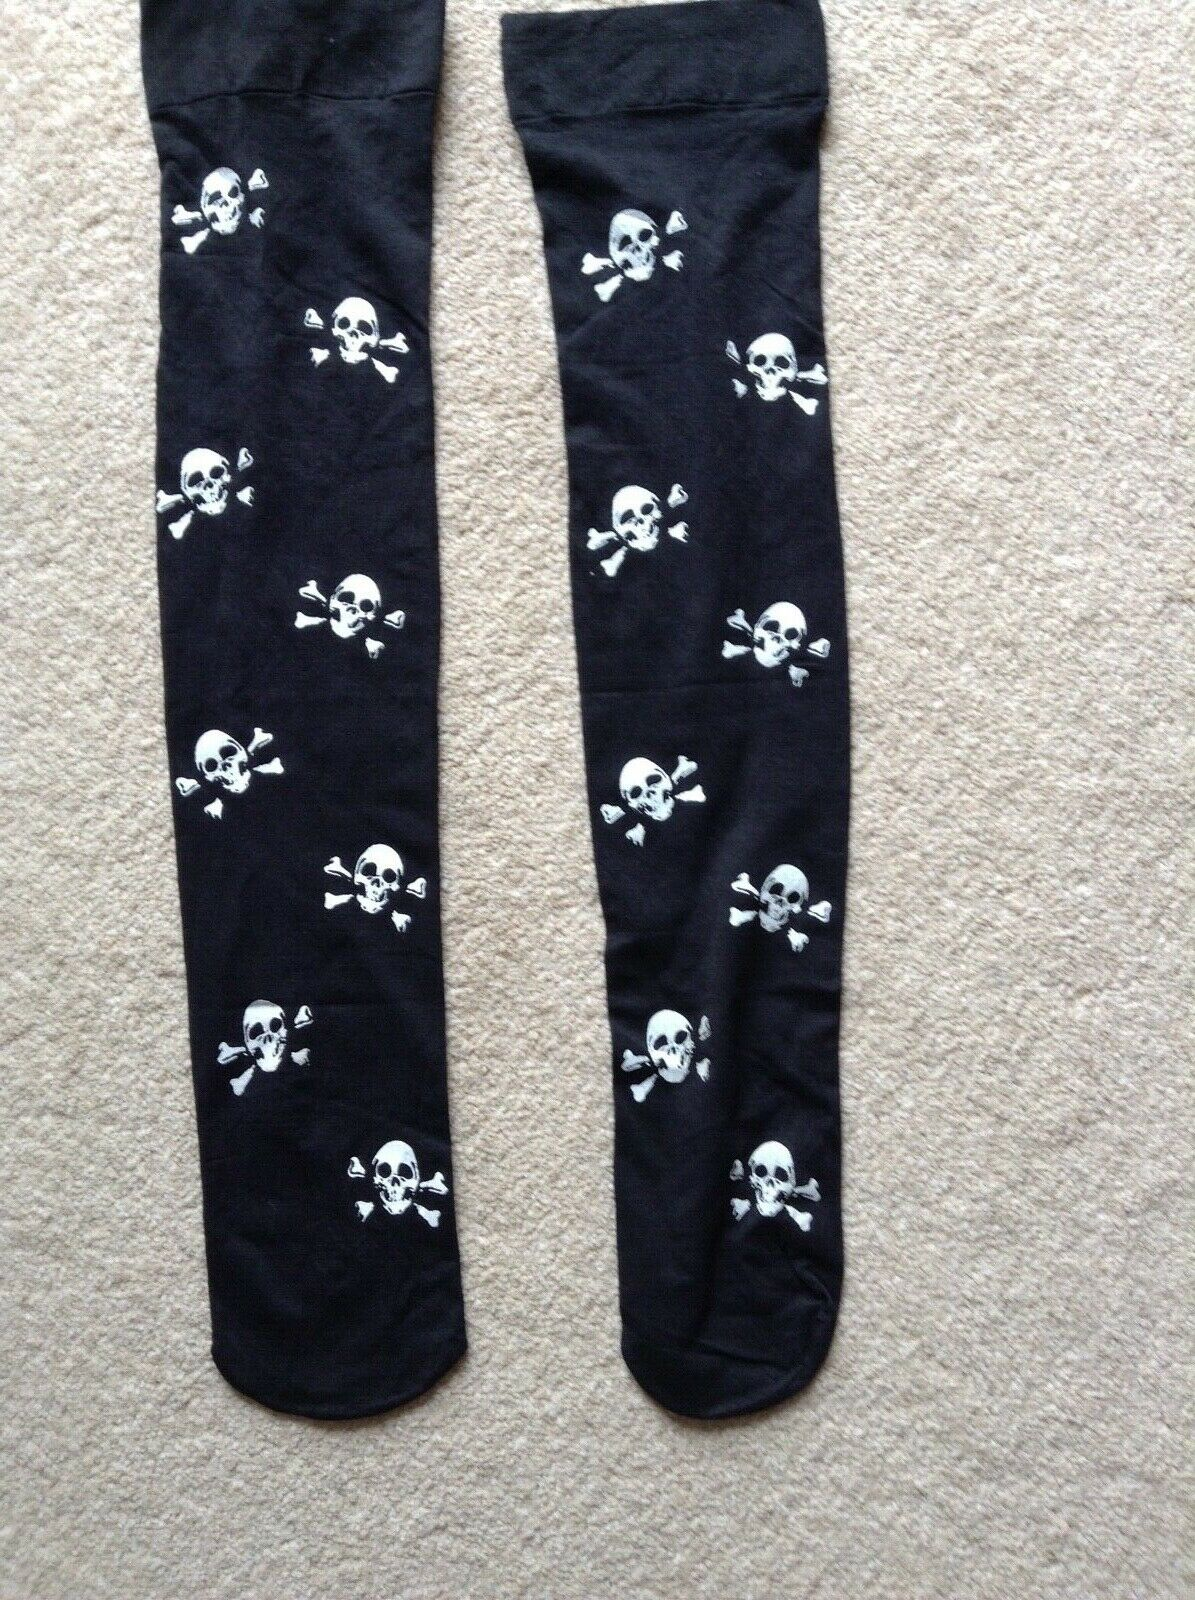 Halloween/Fancy Dress - Over the Knee Skull and Crossbones Socks